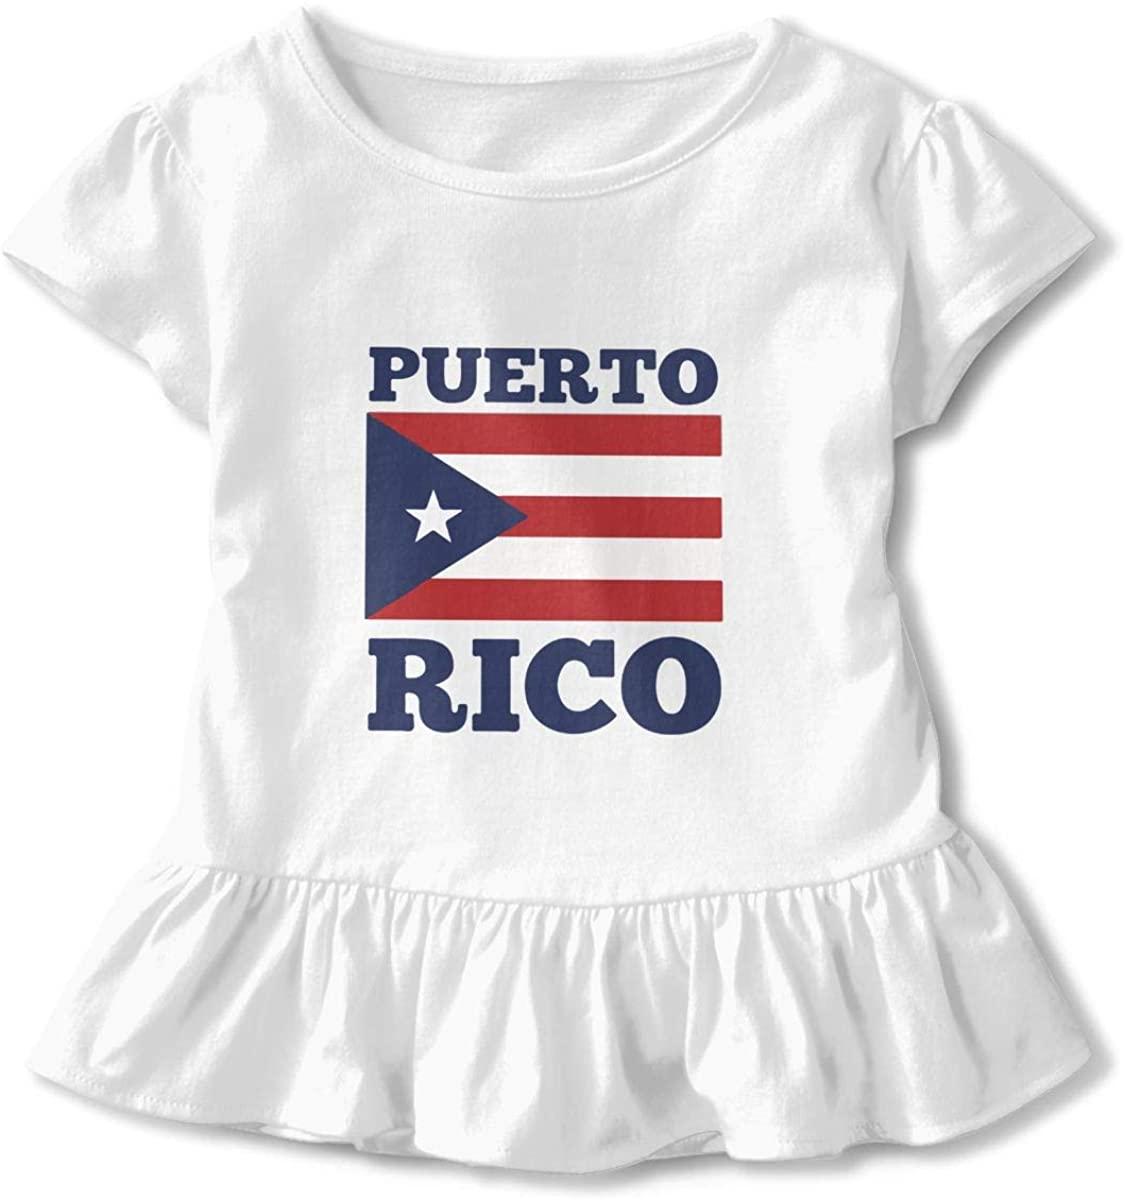 Toddler Girl's Ruffle T-Shirt Puerto Rico Flag Short Sleeve 2-6T